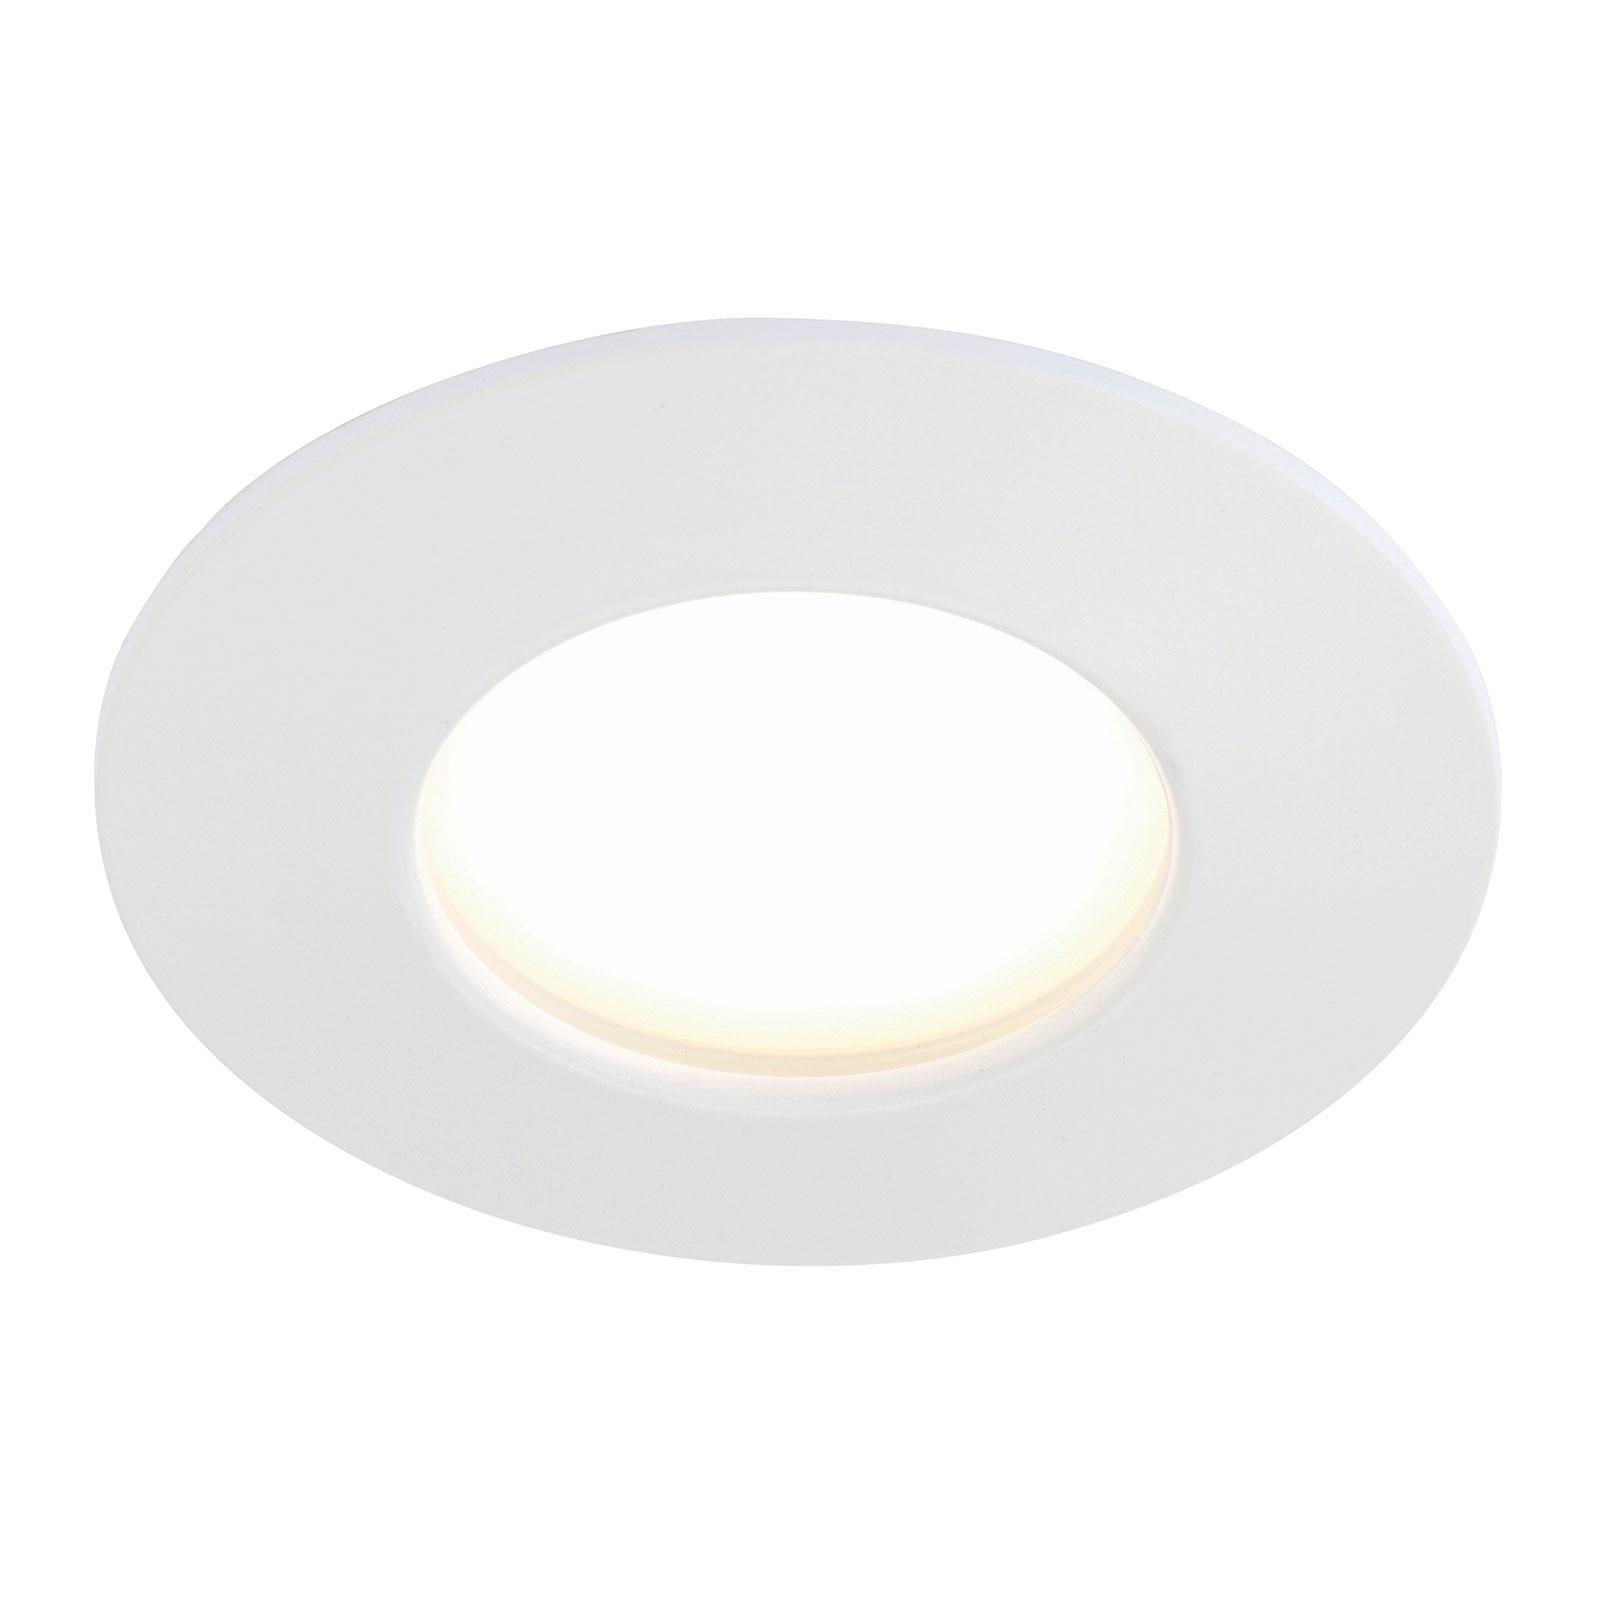 Vit LED-inbyggnadslampa Felia, IP44